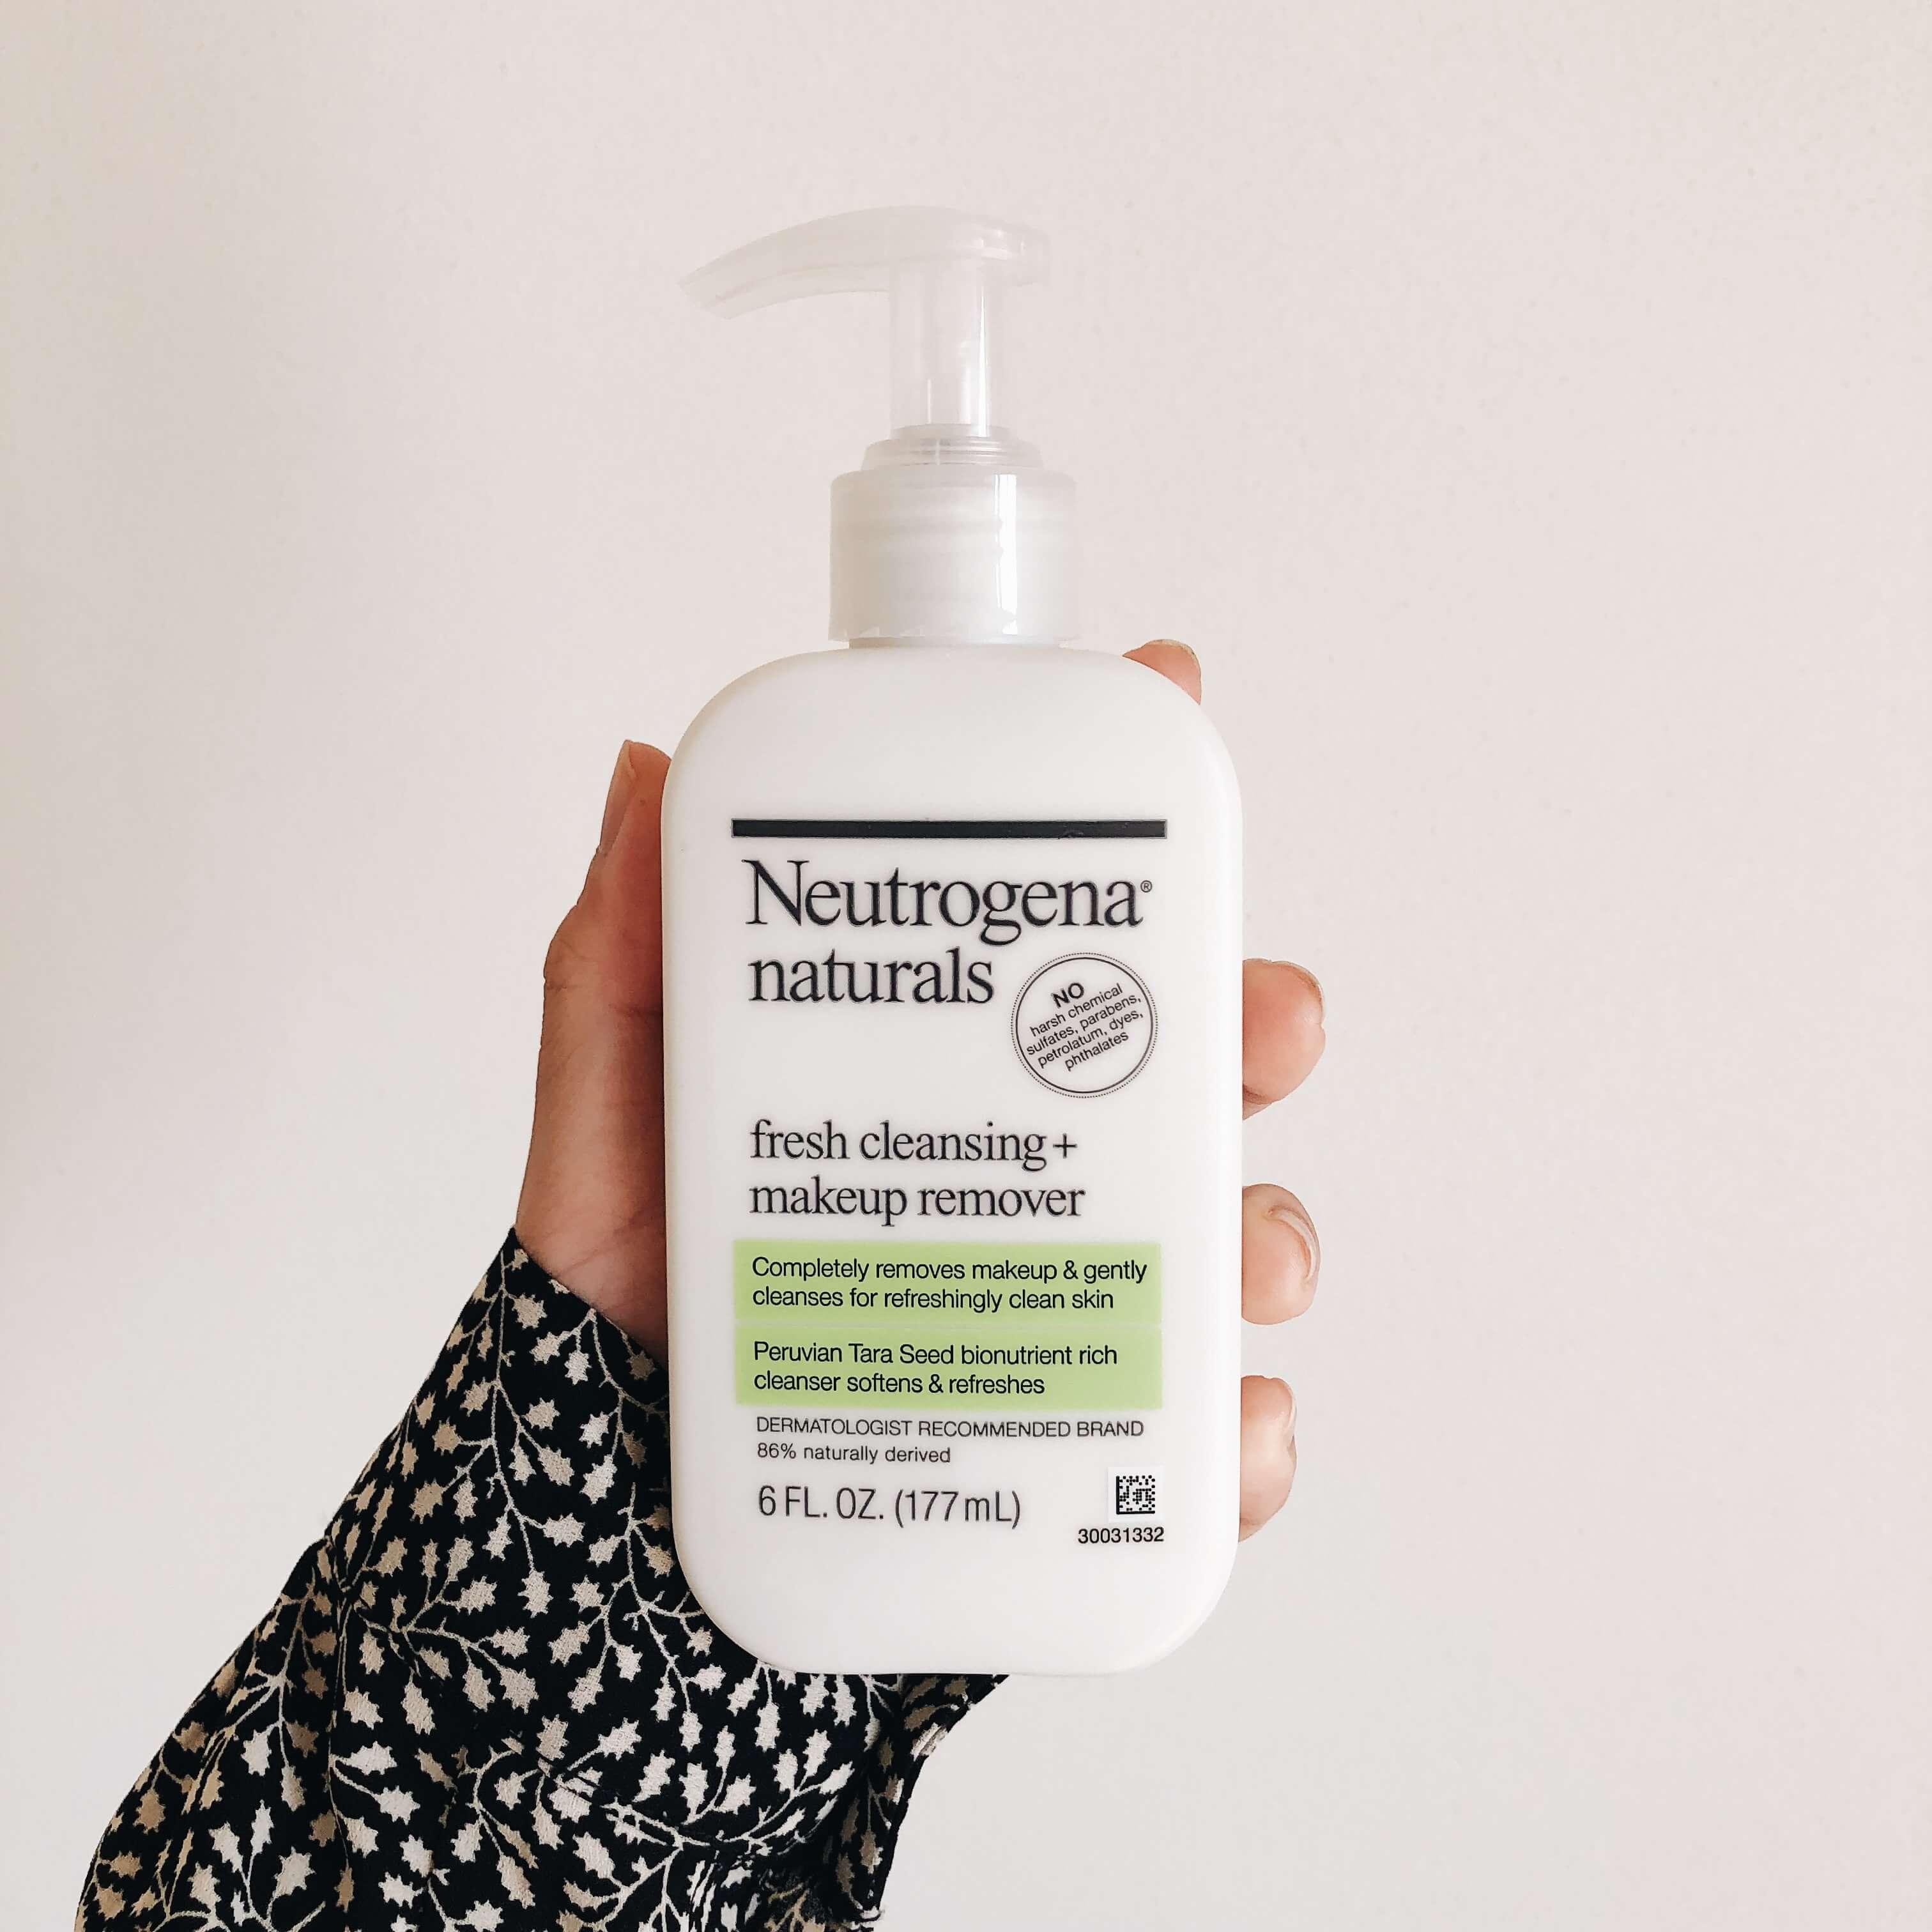 Neutrogena, フレッシュクレンジング + メイクアップリムーバー